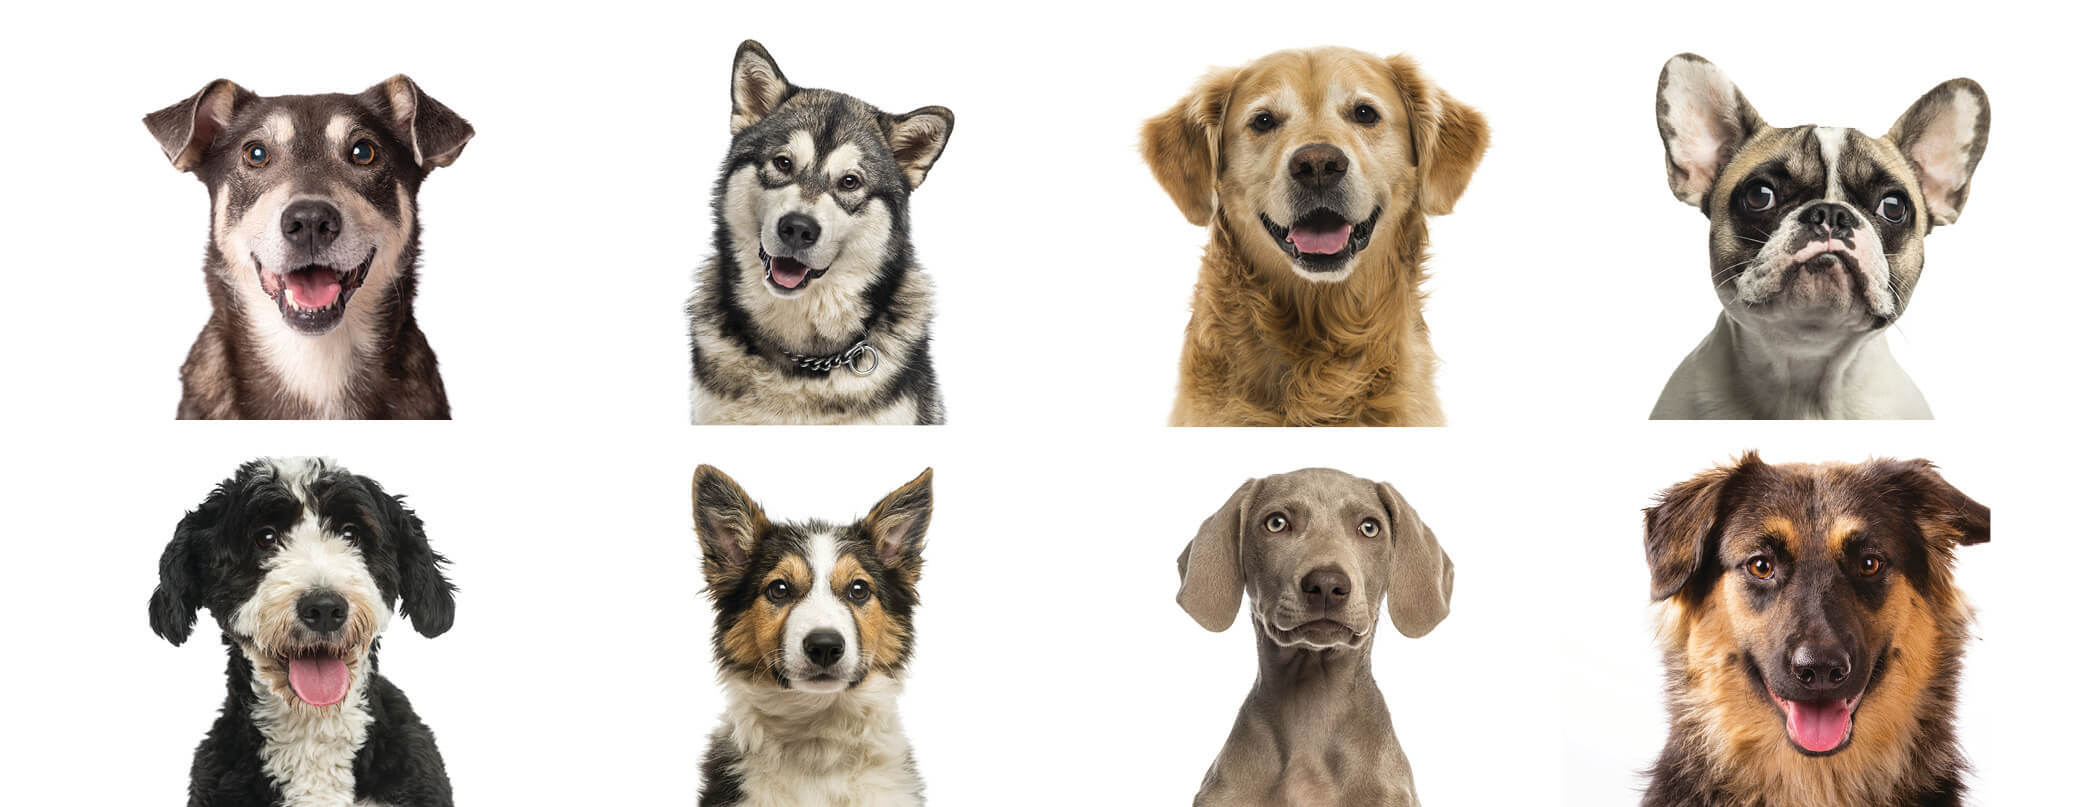 National Dog Day QRILL PET.jpg